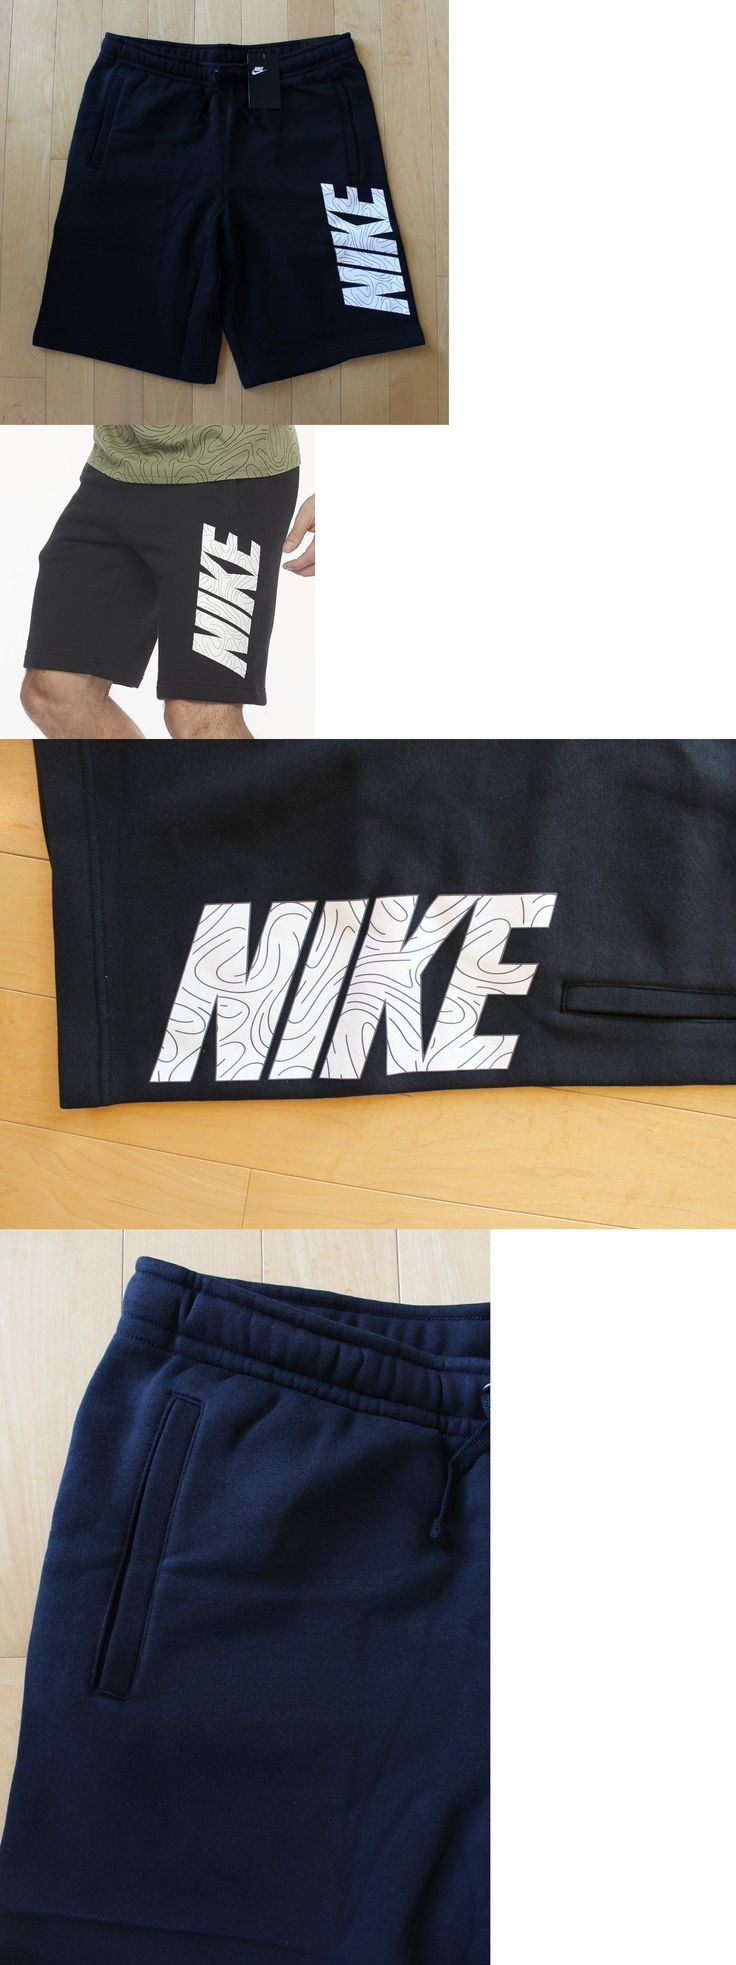 Athletic Apparel 137084: Nwt Nike Men S Logo Fleece Shorts Black White L Xl Xxl -> BUY IT NOW ONLY: $36.95 on eBay!